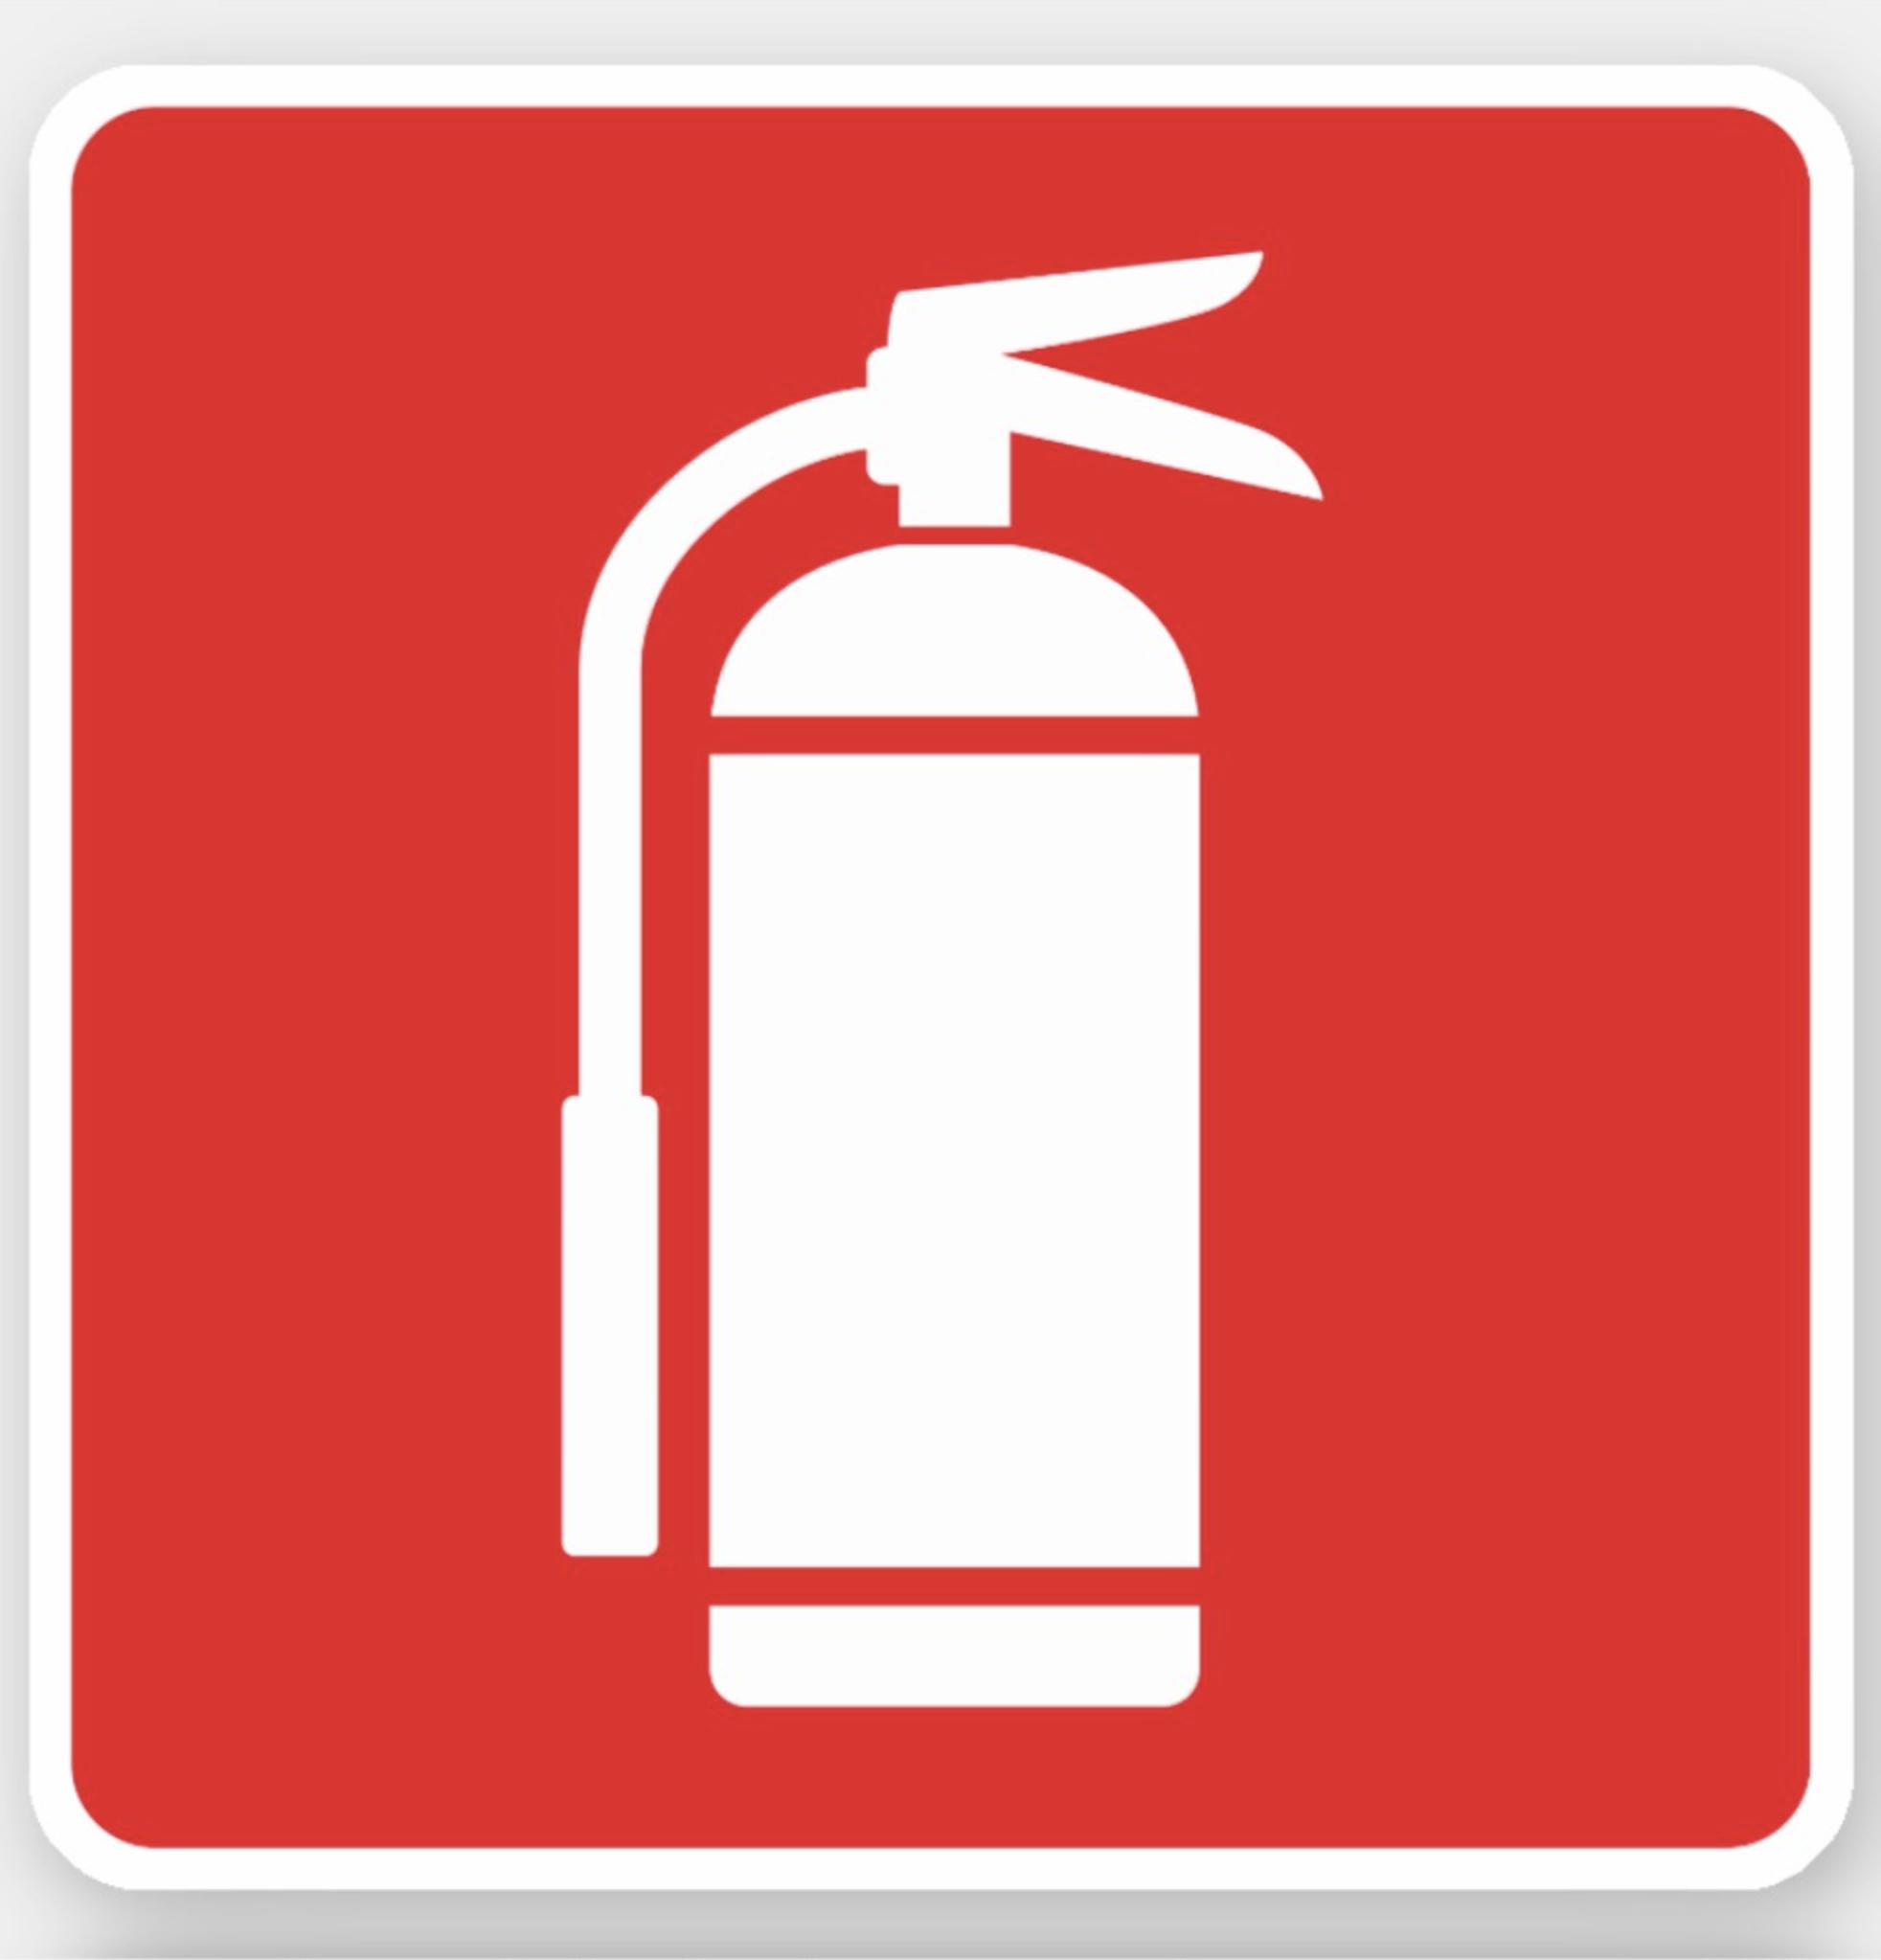 Fire Extinguisher Symbol White On Red Sticker Zazzle Com In 2021 Extinguisher Fire Extinguisher Symbols